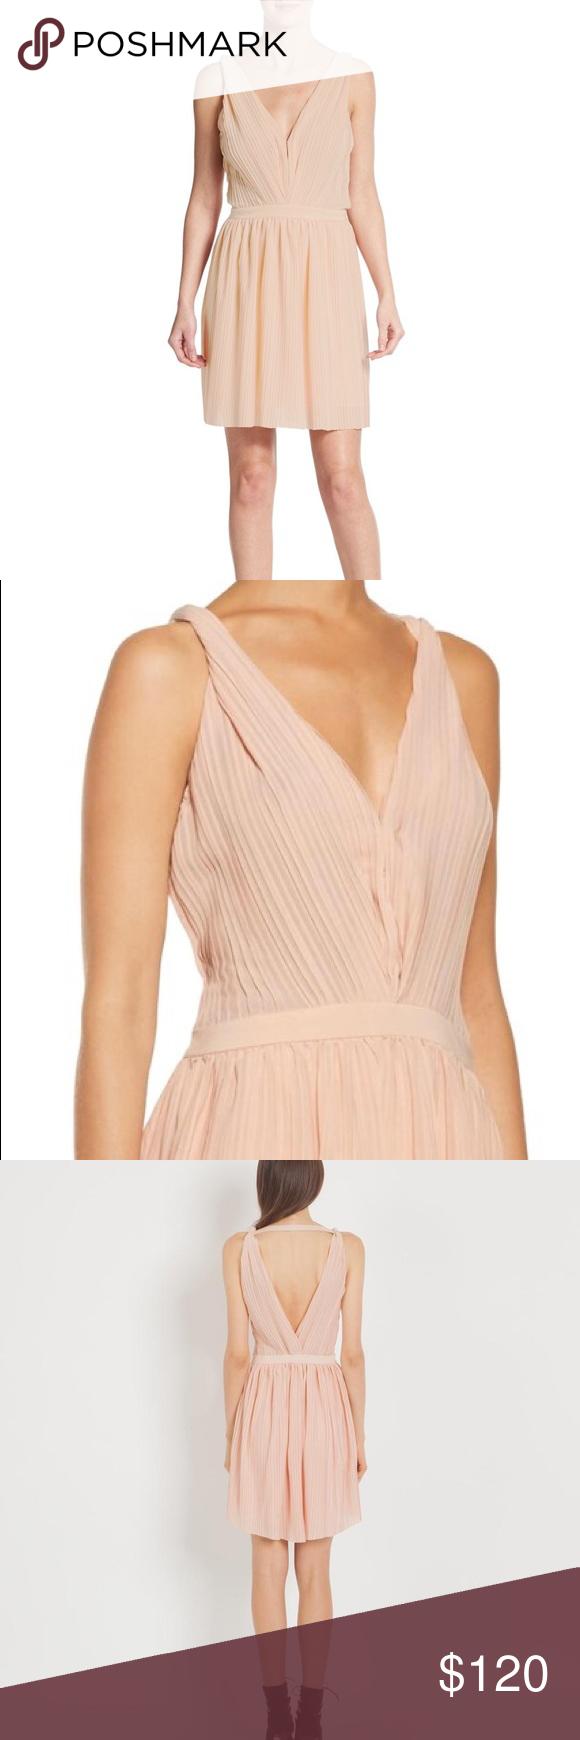 MAJE Frasera Blush Pink Grecian Pleated Dress Labeled French